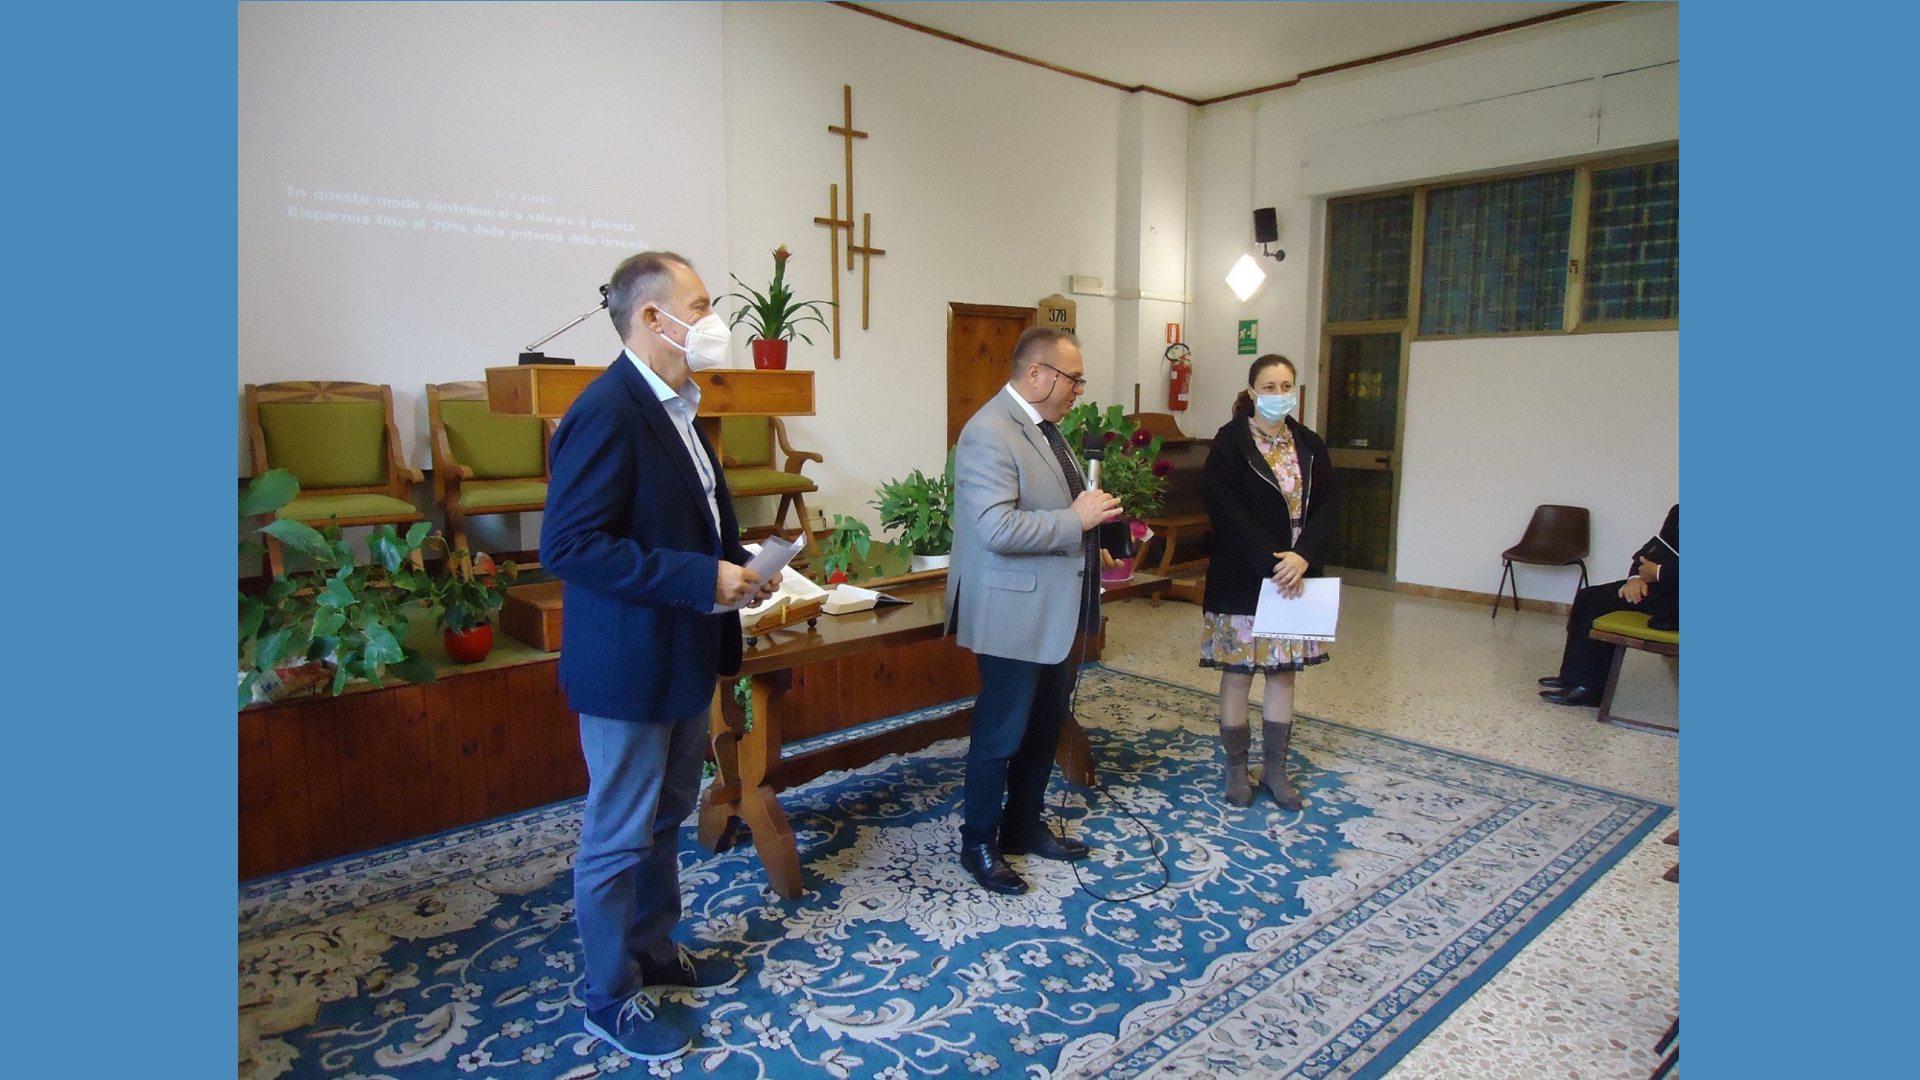 Roma Ostia – Consacrazione diacono e diaconessa 2021